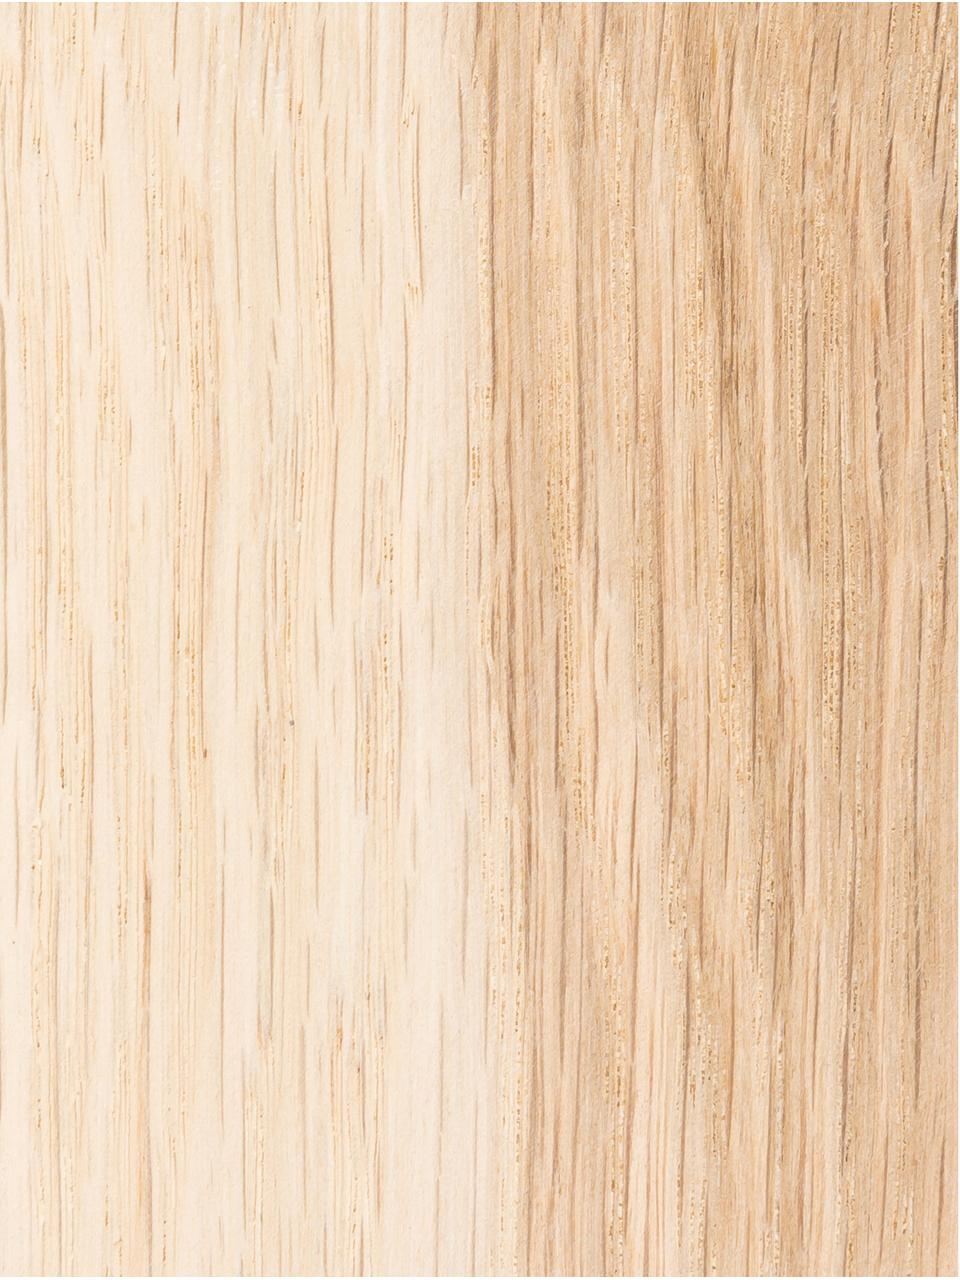 Tabouret bois de chêne massif Block, Chêne